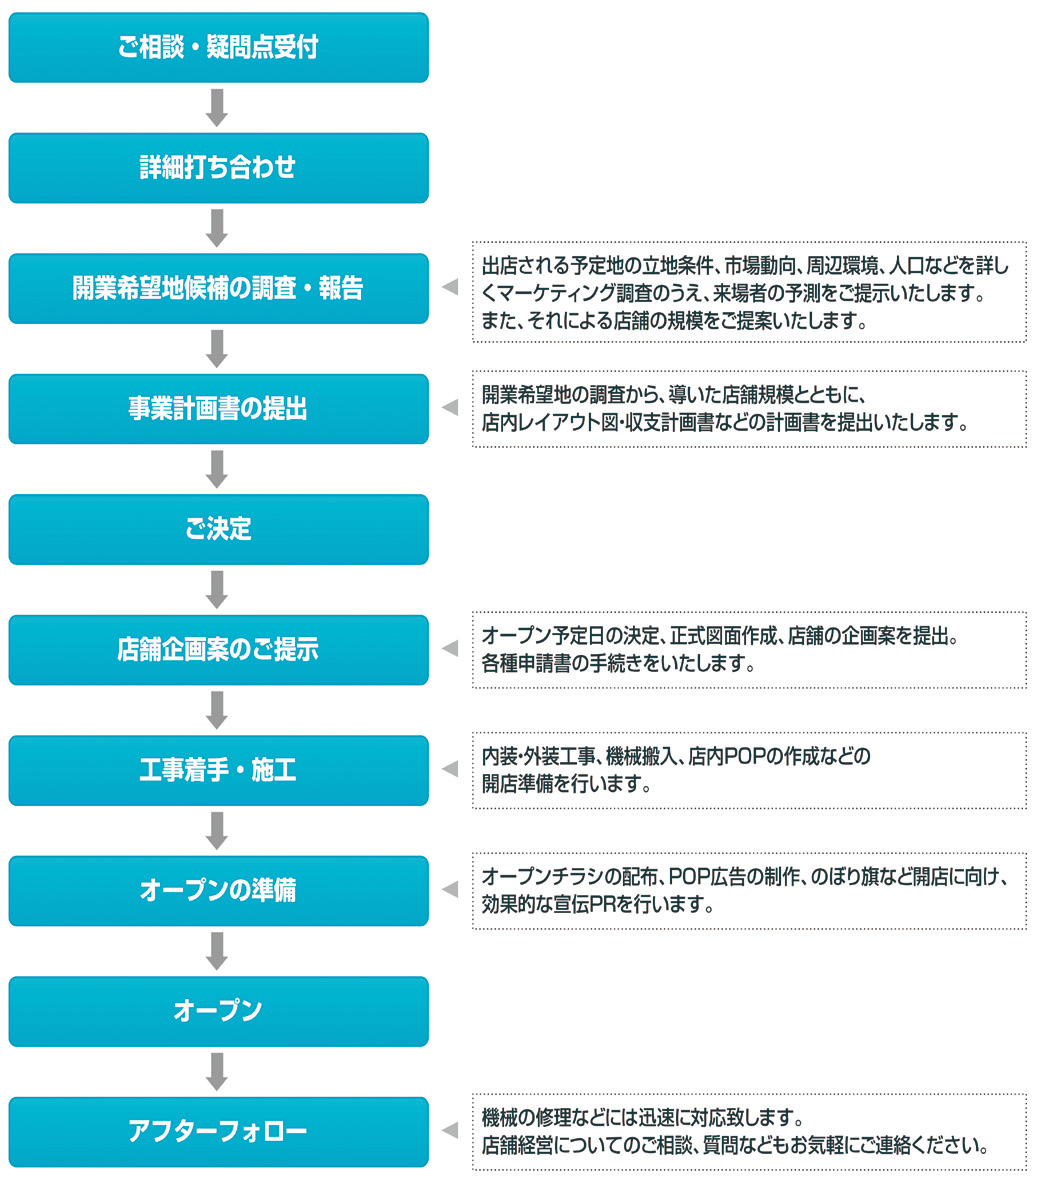 f:id:murakamihjm:20200107103157p:plain